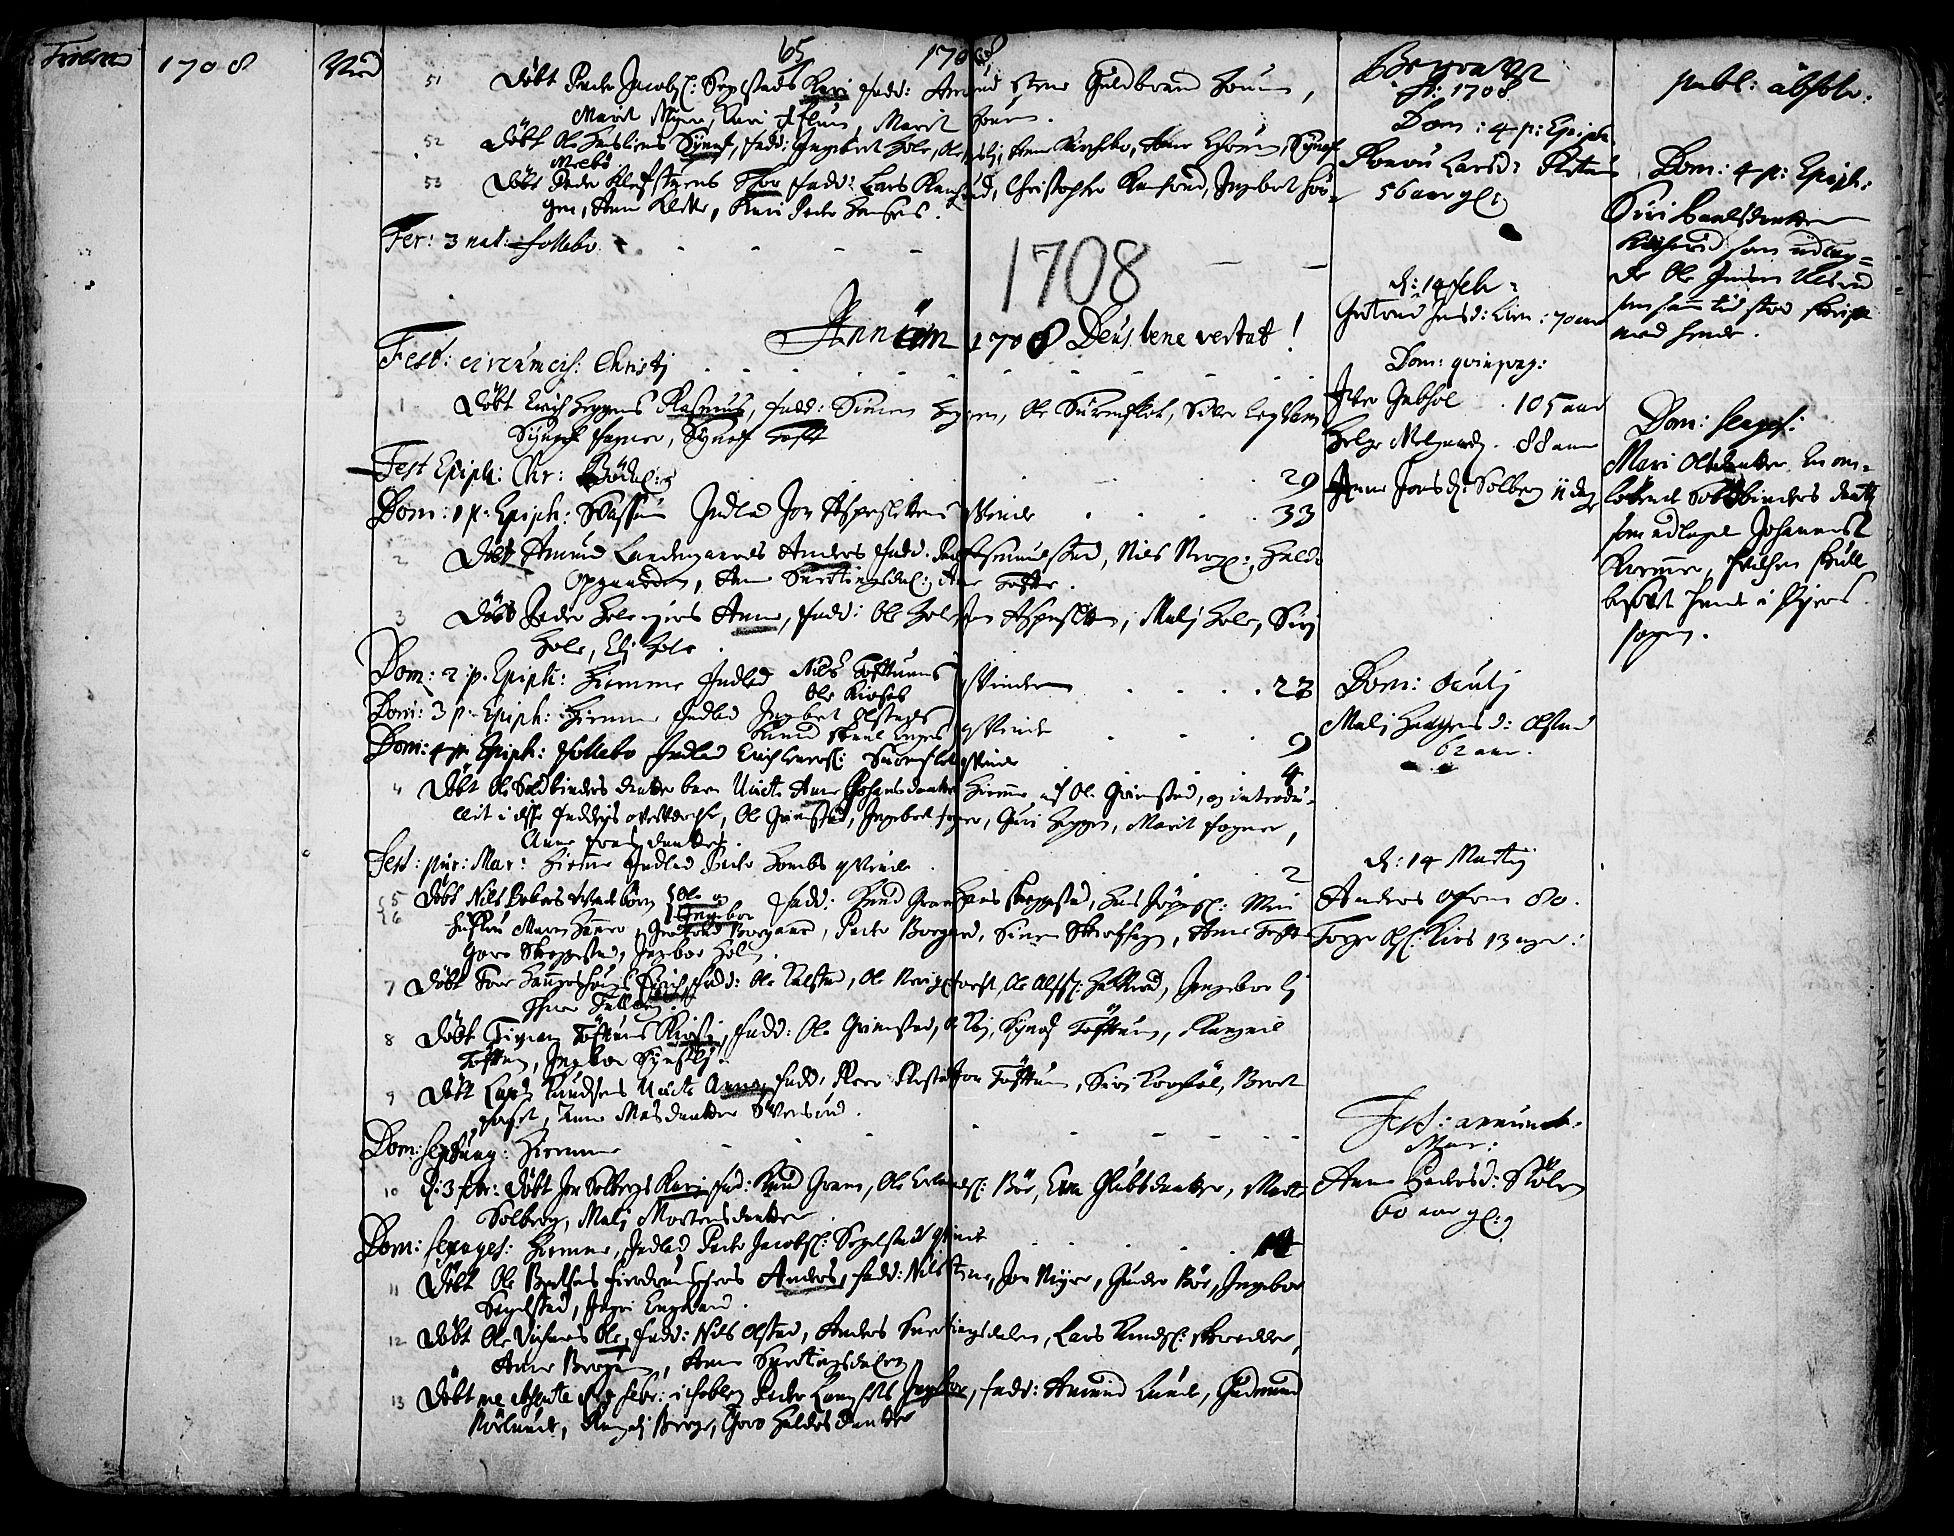 SAH, Gausdal prestekontor, Ministerialbok nr. 1, 1693-1728, s. 65